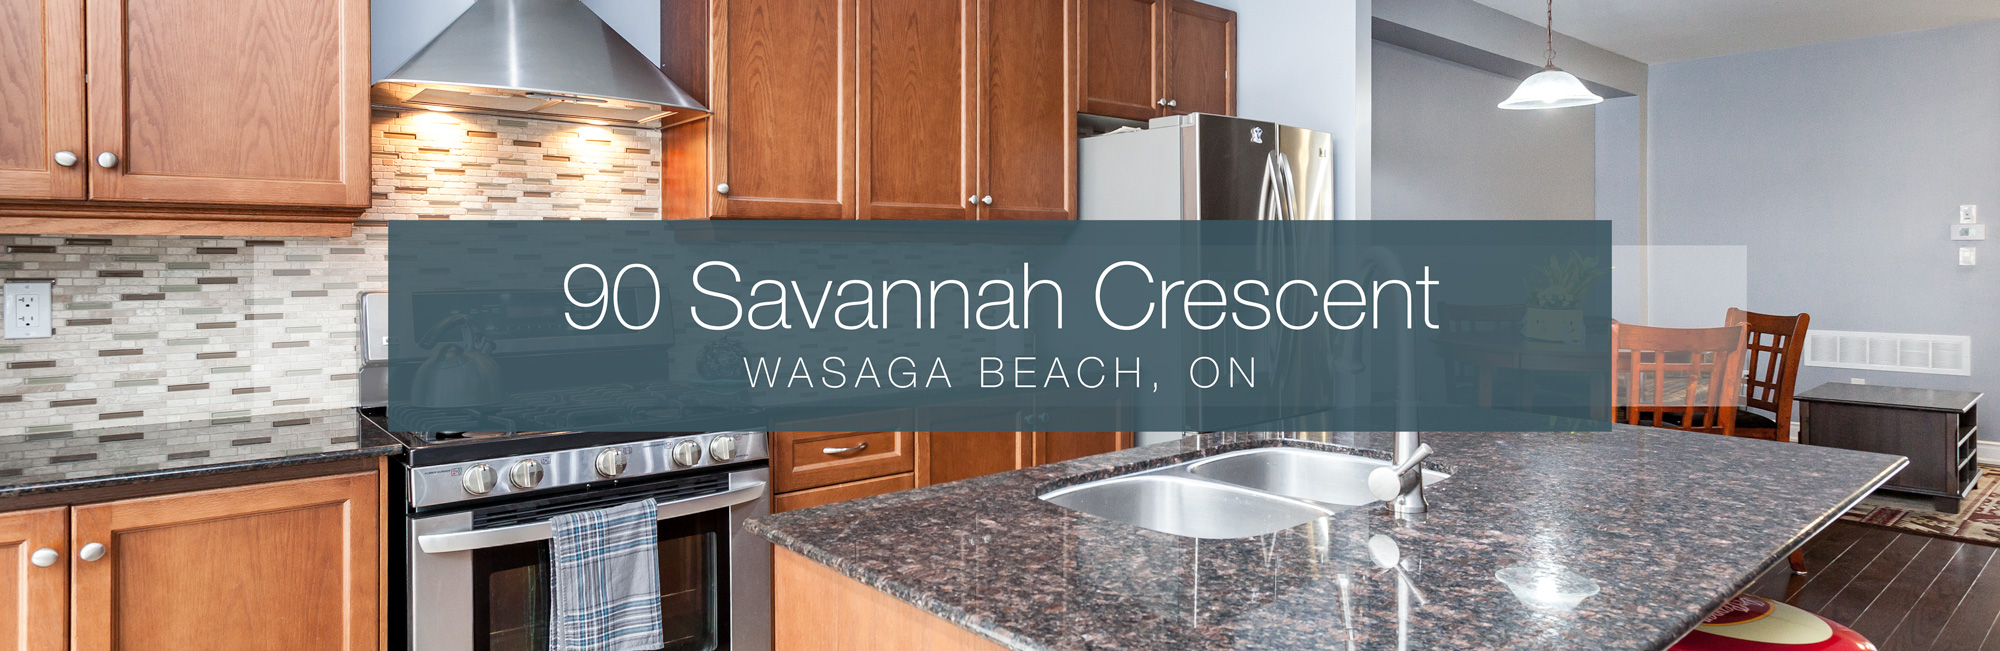 90-Savannah-Crescent-Banner.jpg